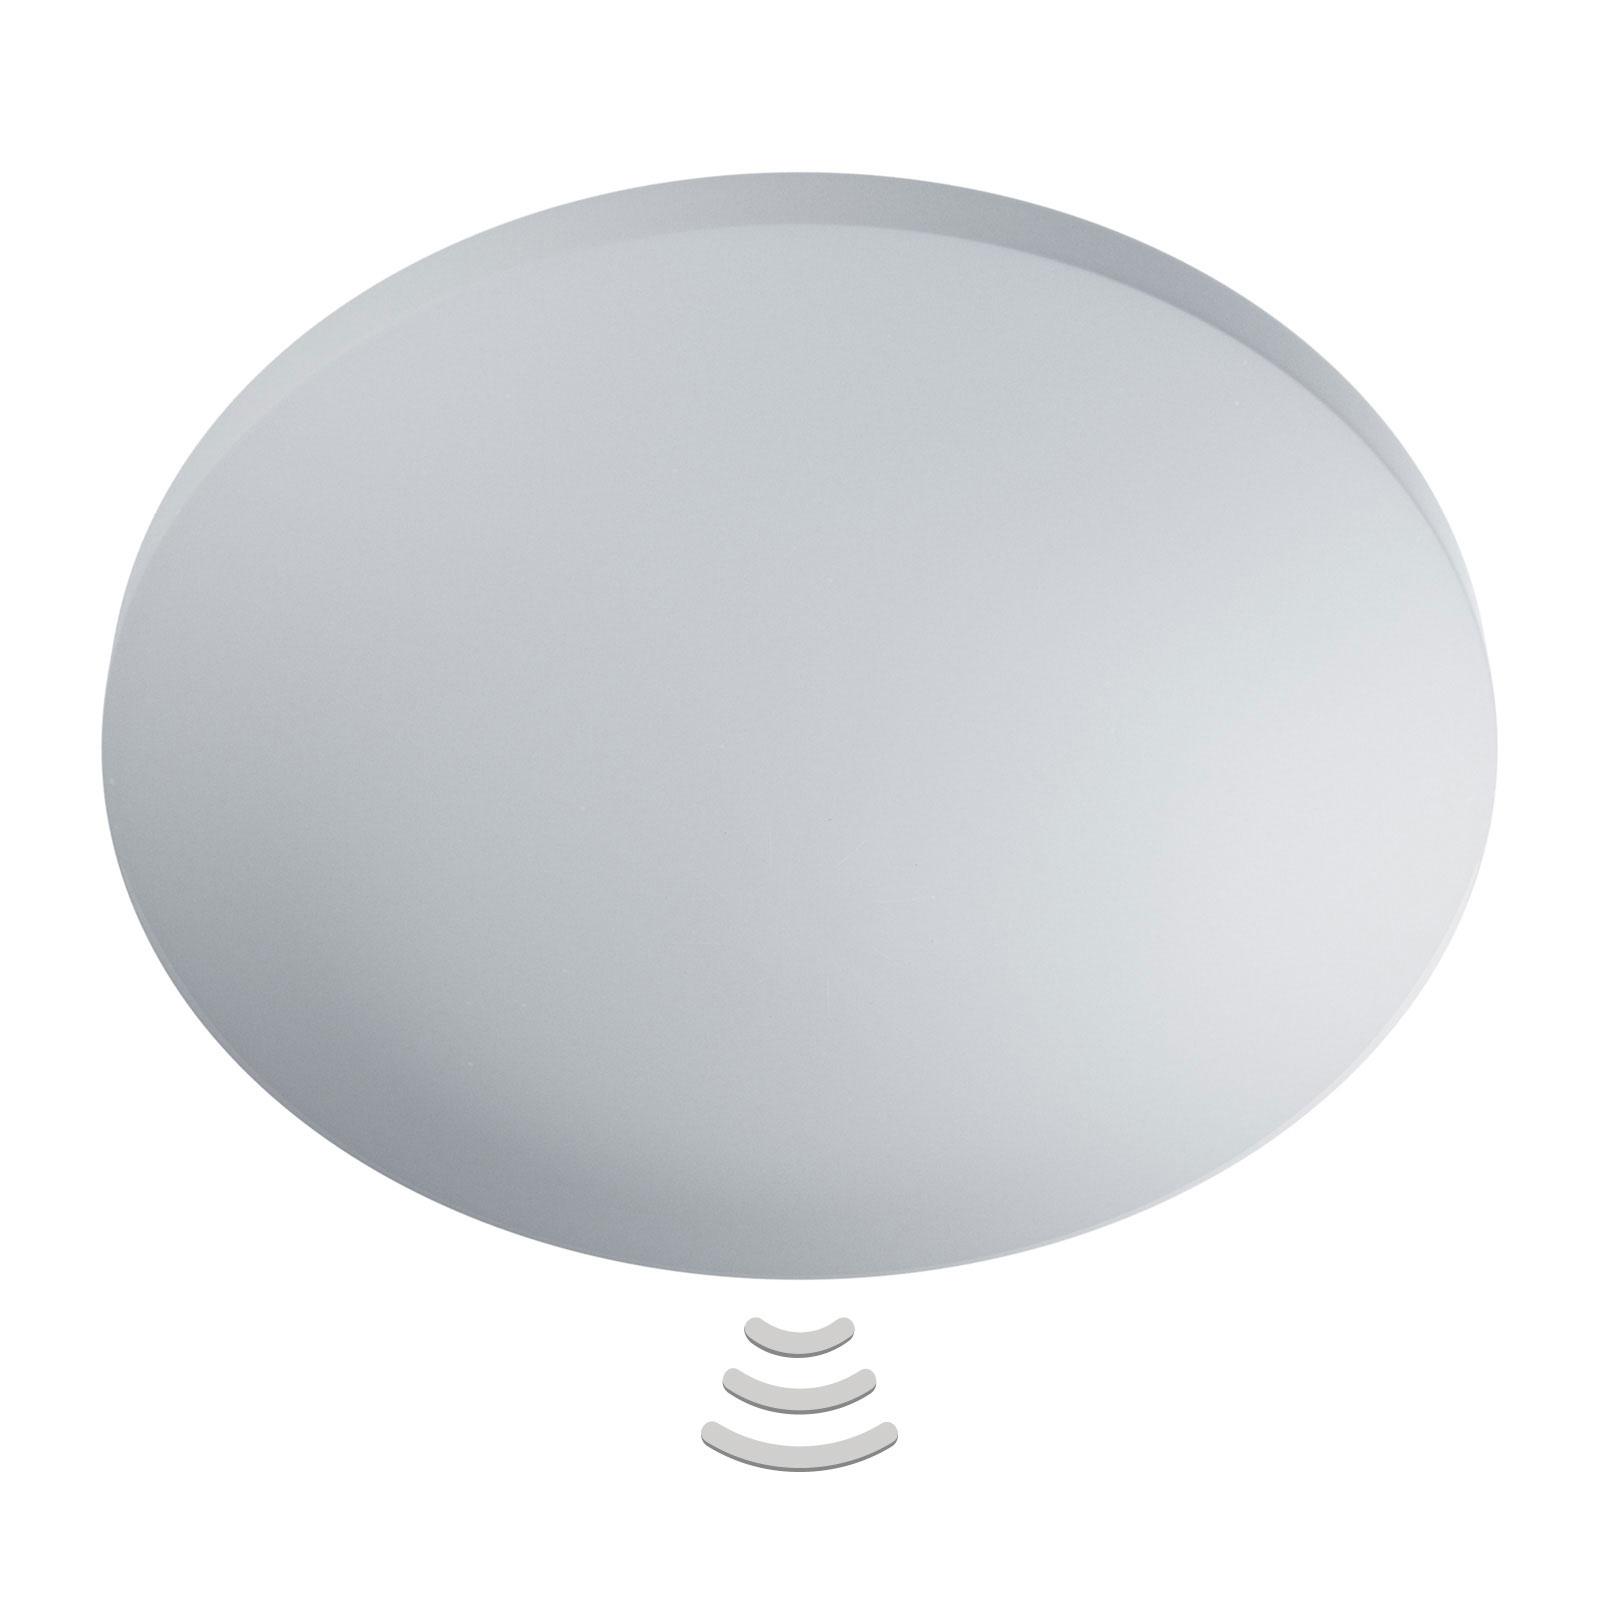 LEDVANCE Orbis taklampe med sensor IP44 30 cm